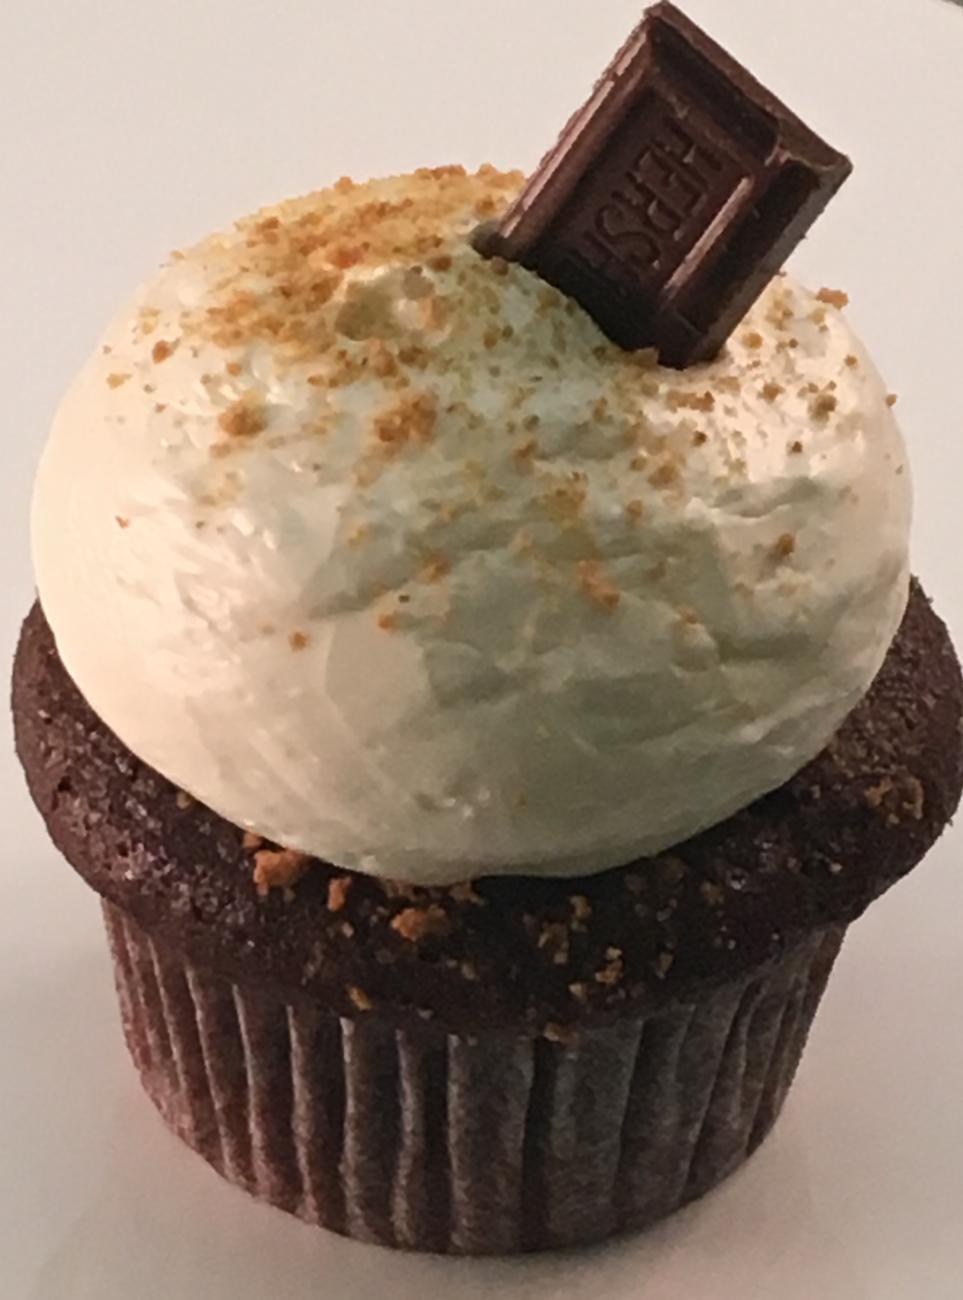 Smores clipart graham cake. S mores wanna cupcake